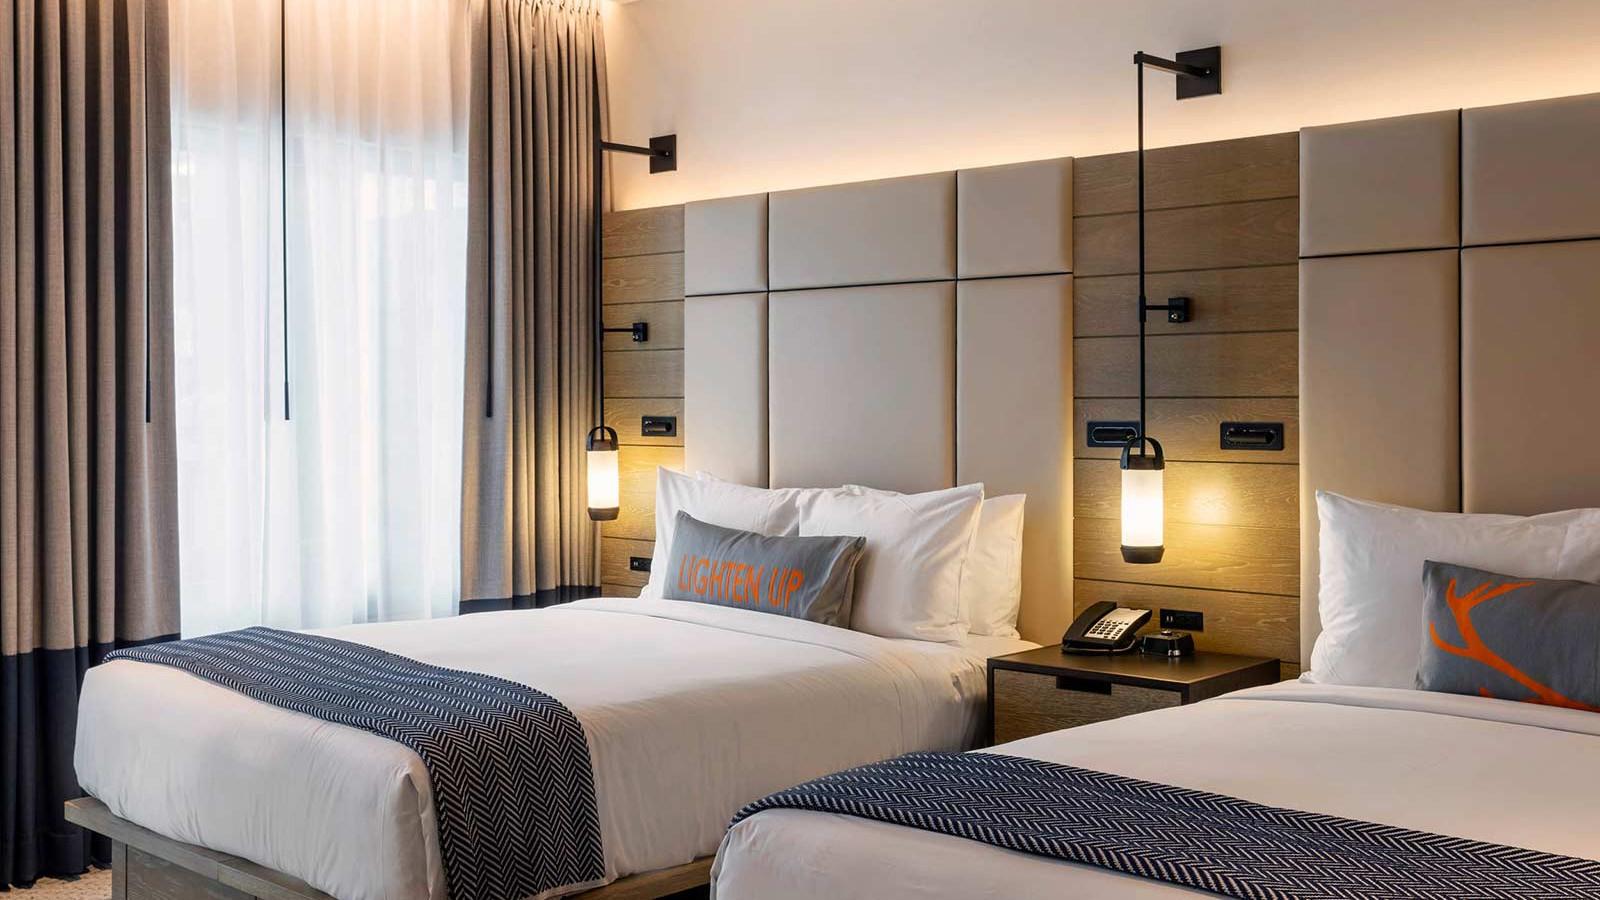 Limelight Snowmass Hotel, Aspen - Deluxe room